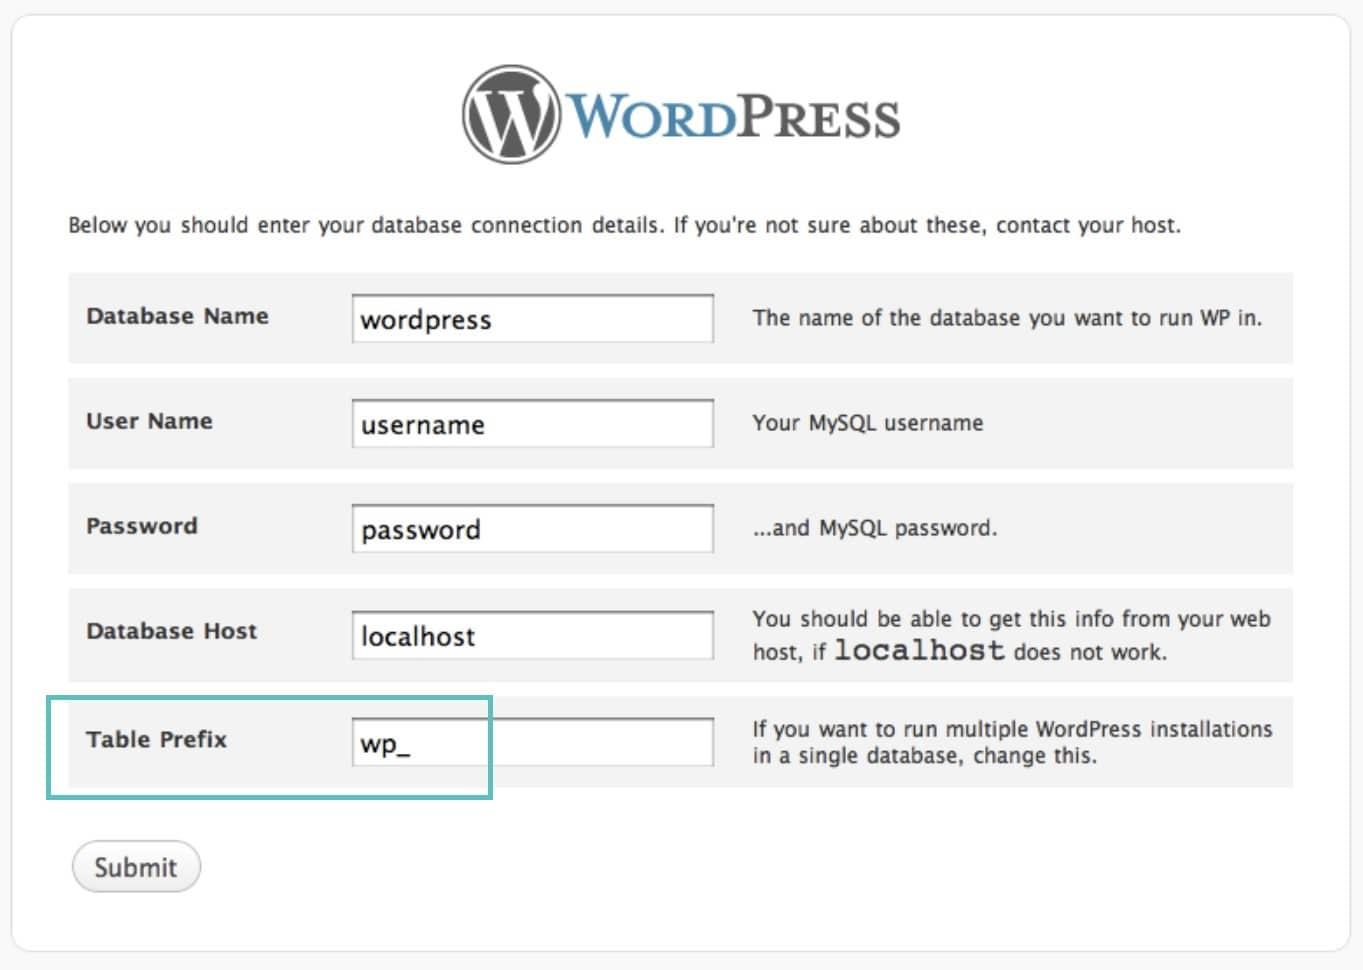 wordpress table prefix